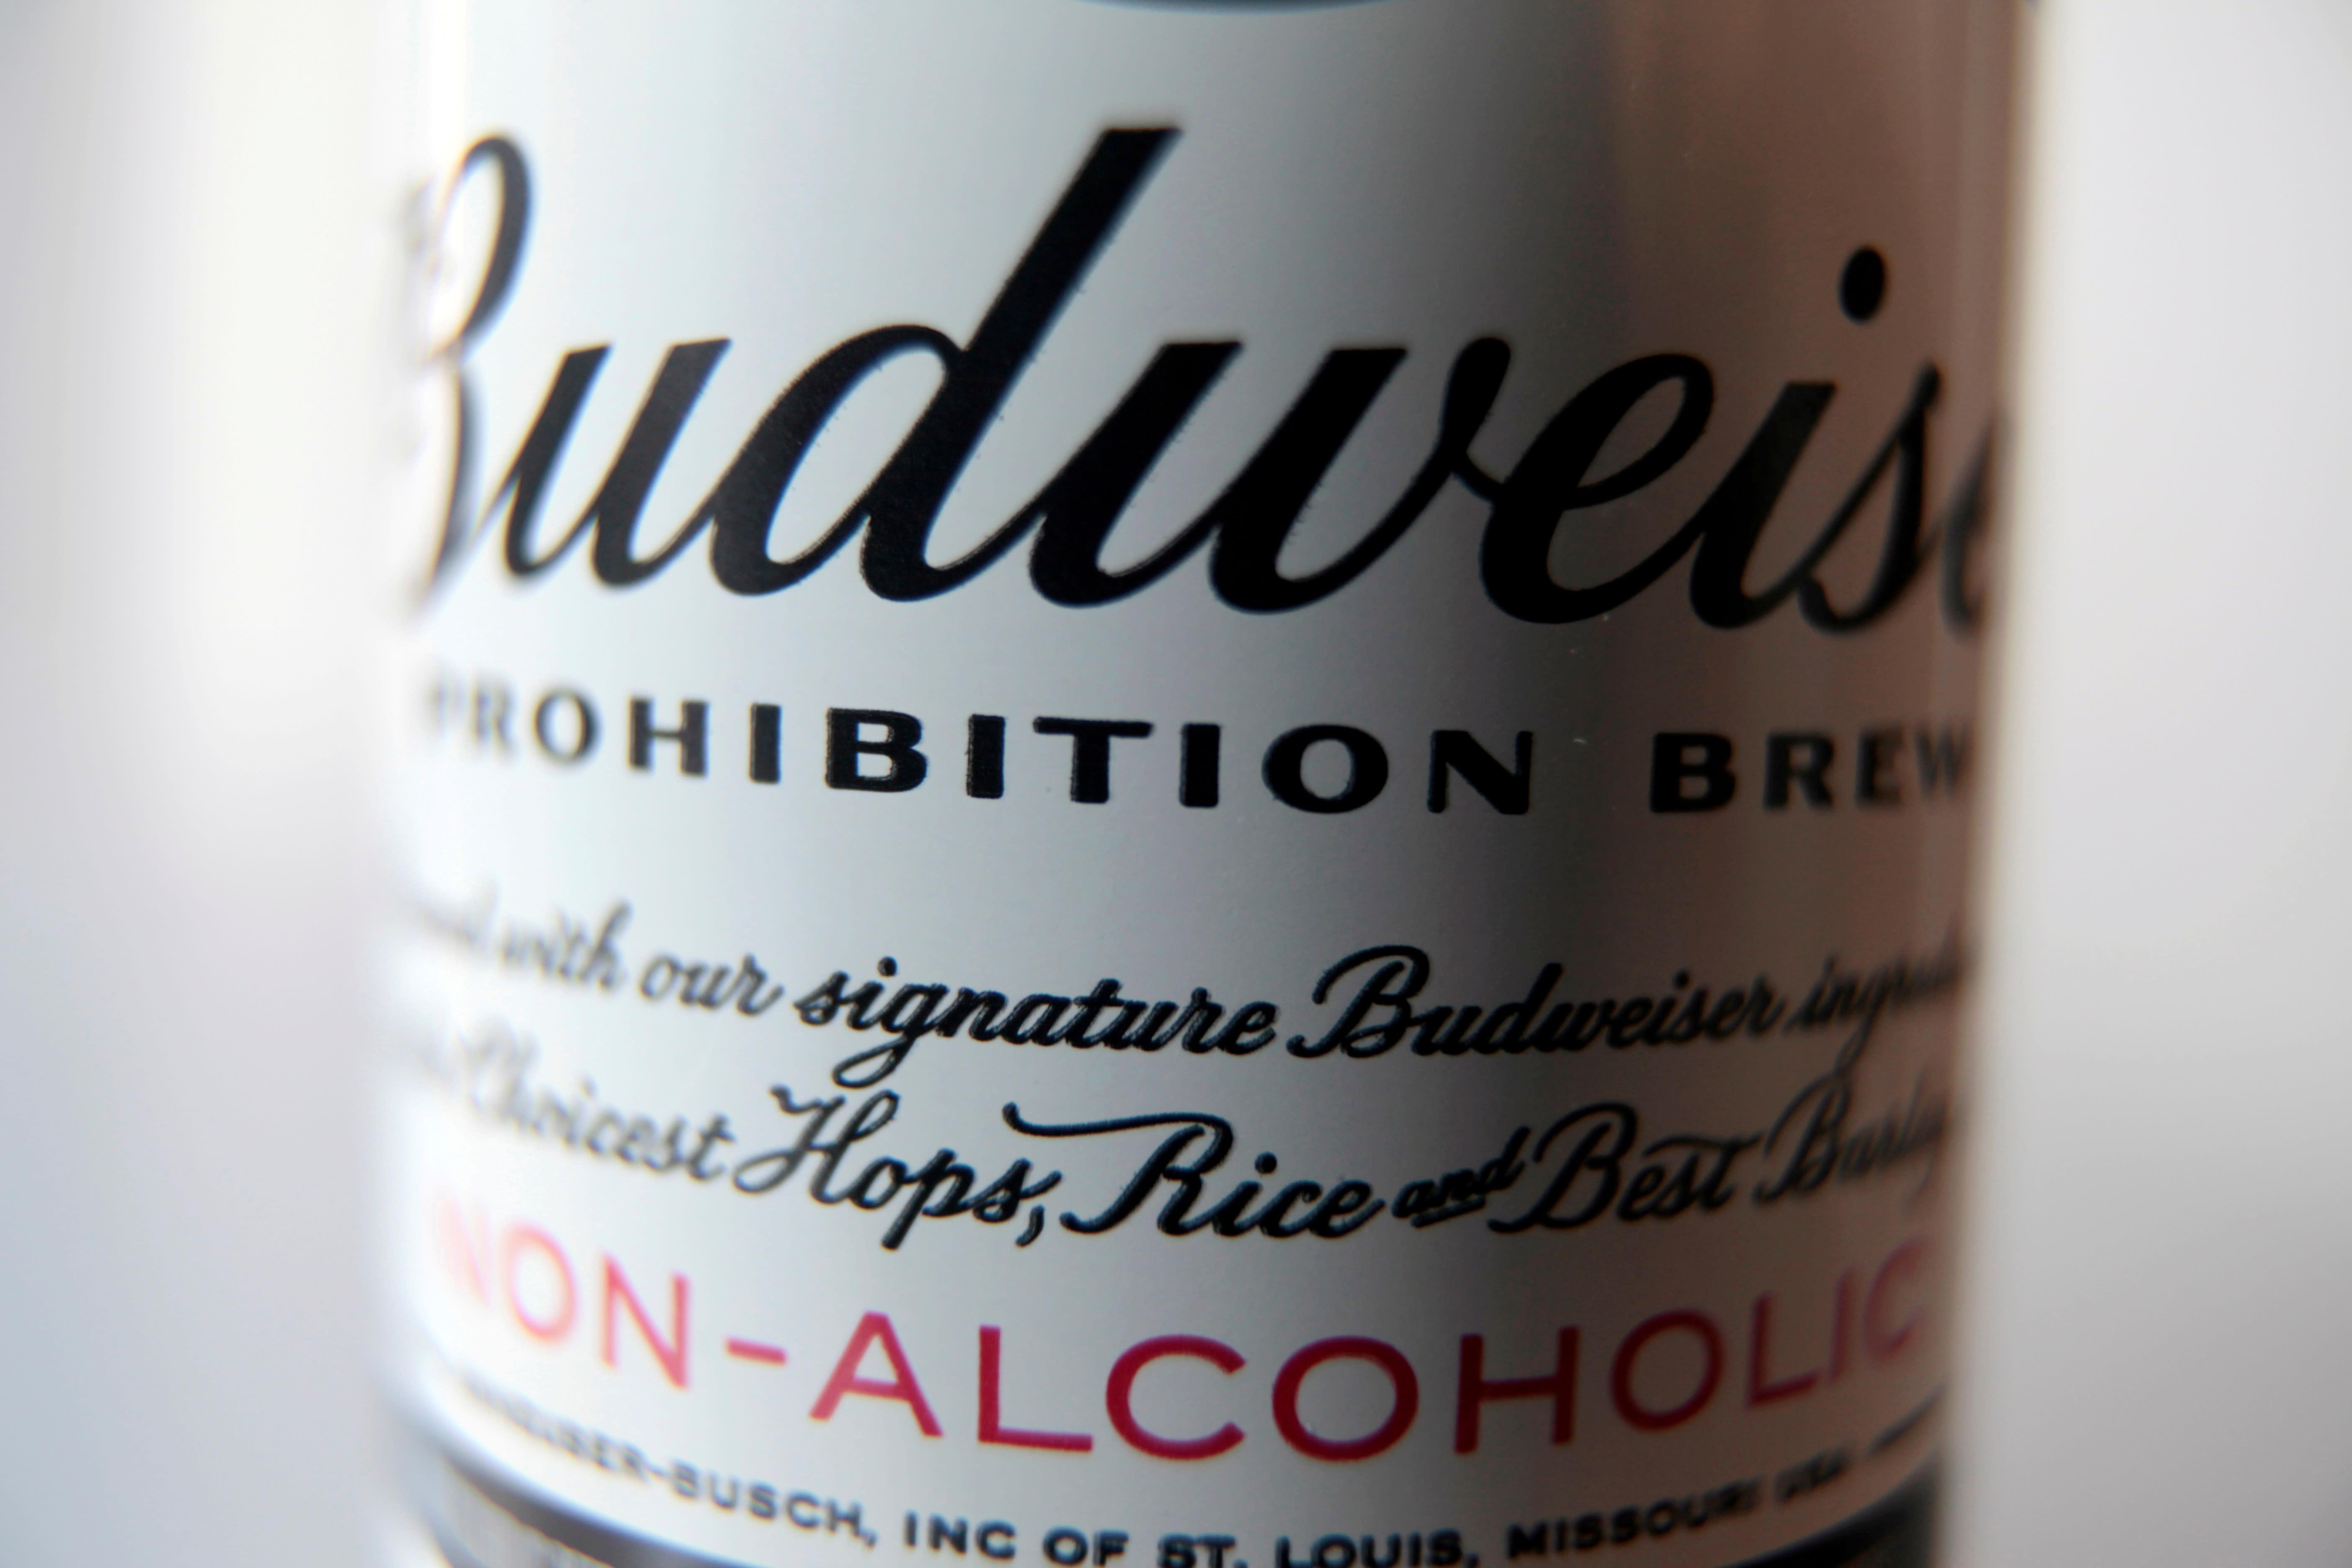 Why the coronavirus could hurt Budweiser beer